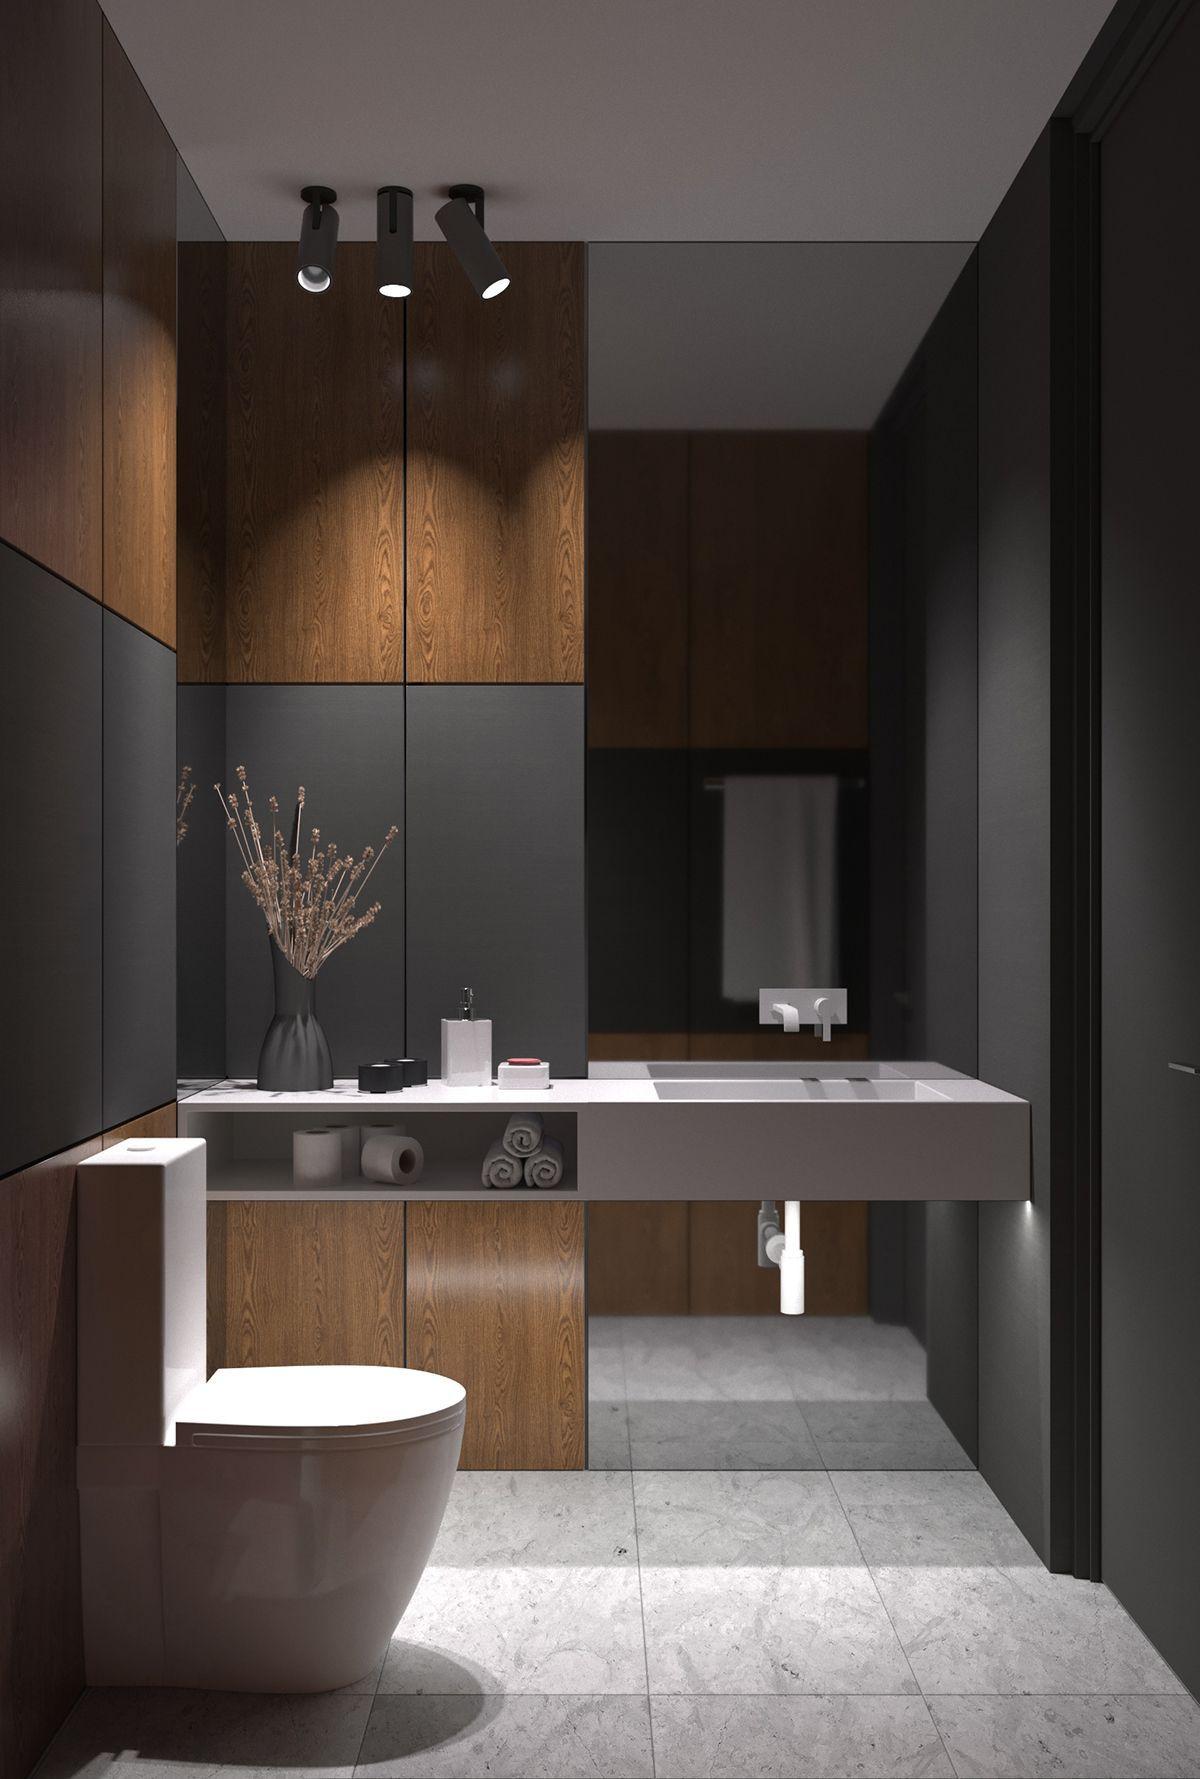 5 x 4 badezimmerdesigns what have these lighting designs in common  interior  pinterest